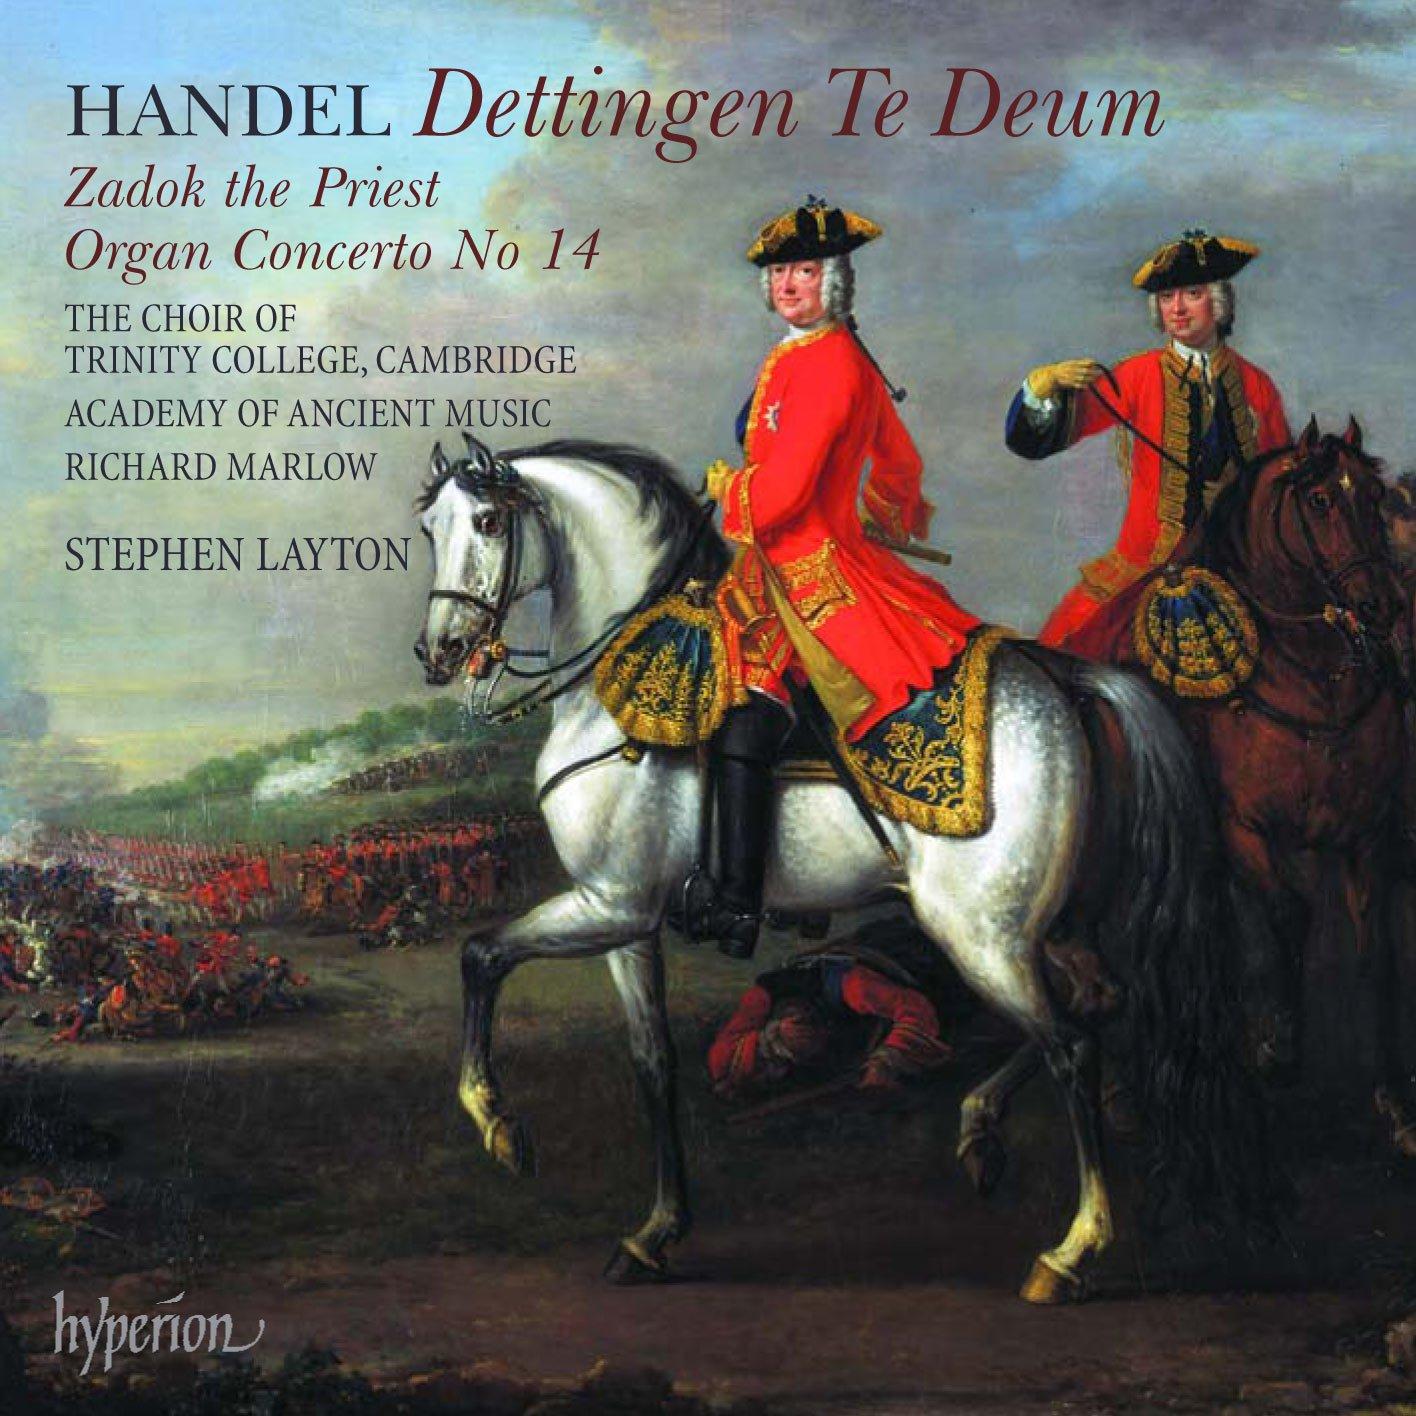 Handel: Dettingen Te Deum / Zadok the Priest / Organ Cto 4 by HYPERION